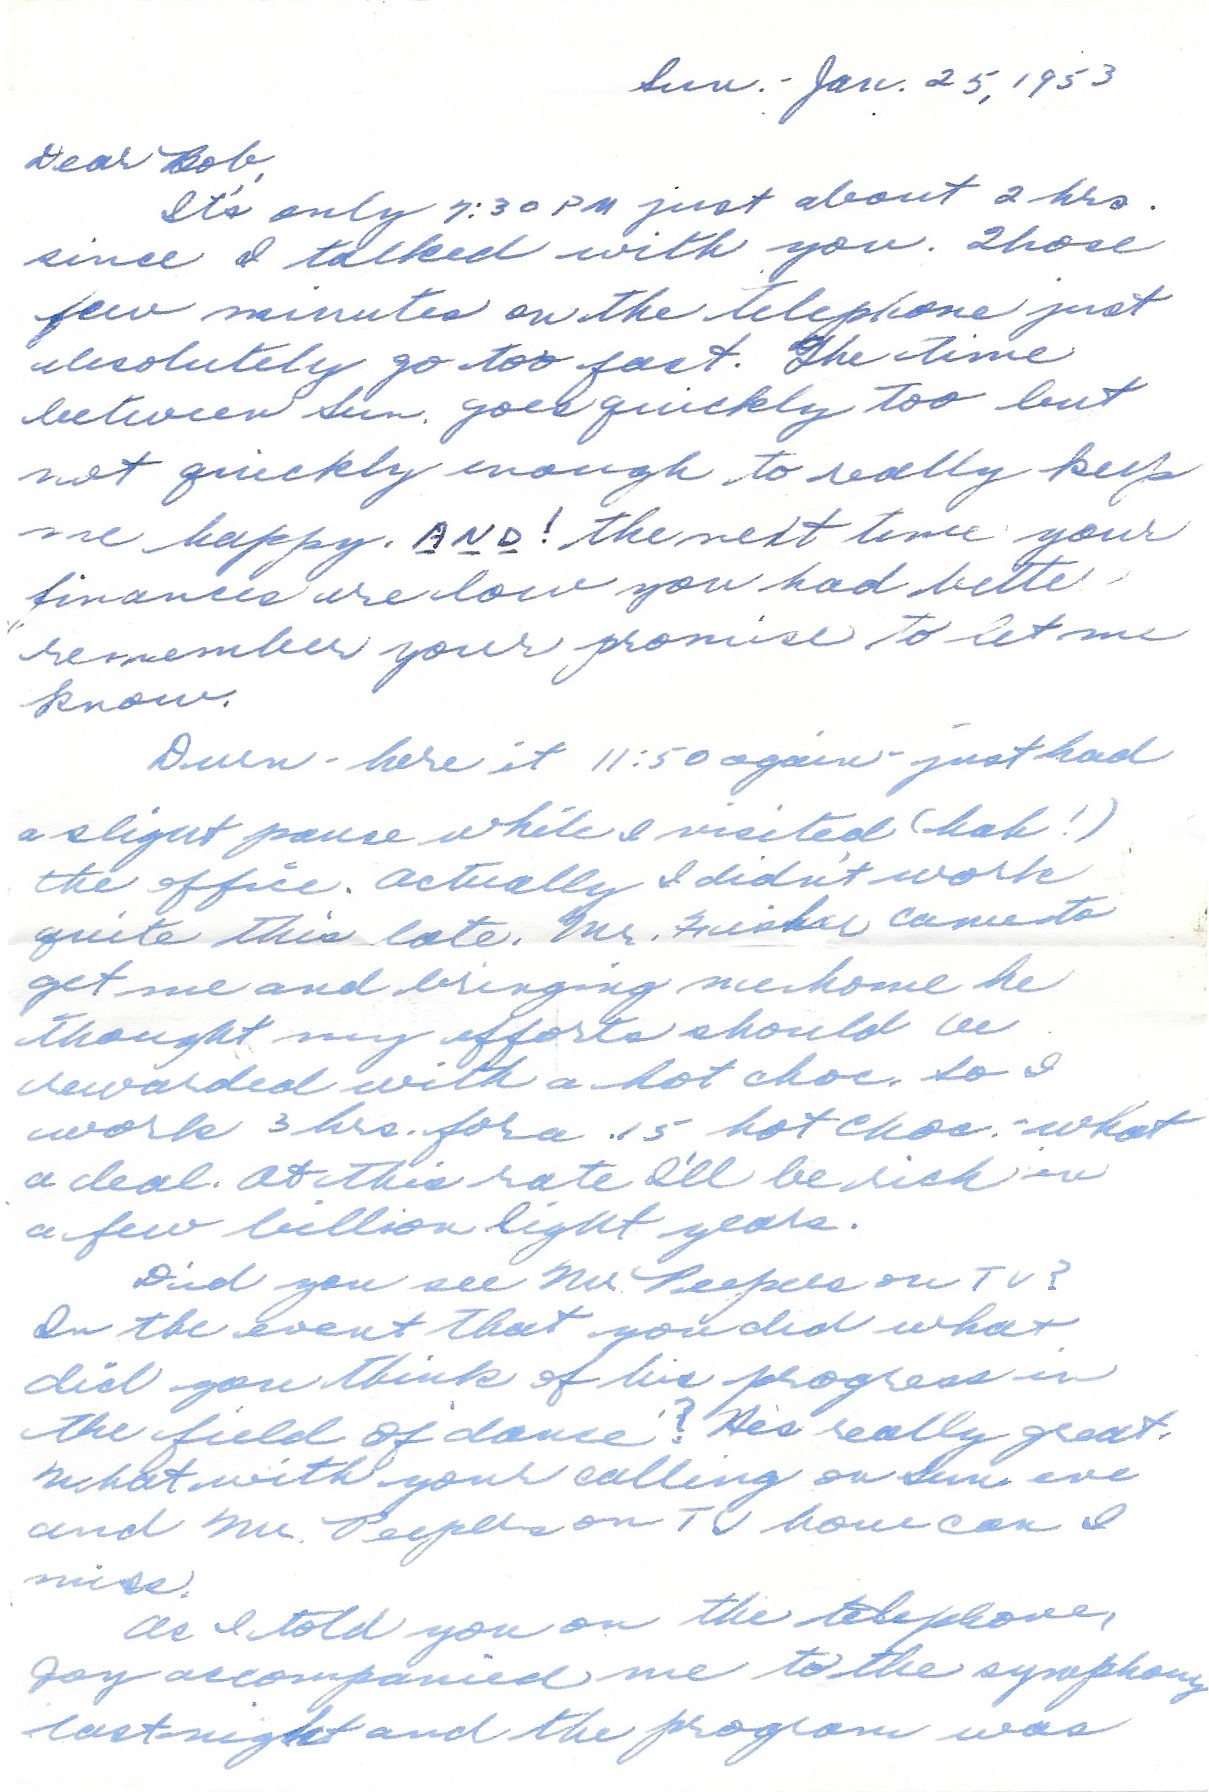 14. Jan. 25, 1953 (Oma)_Page_1 (Rescan).jpeg